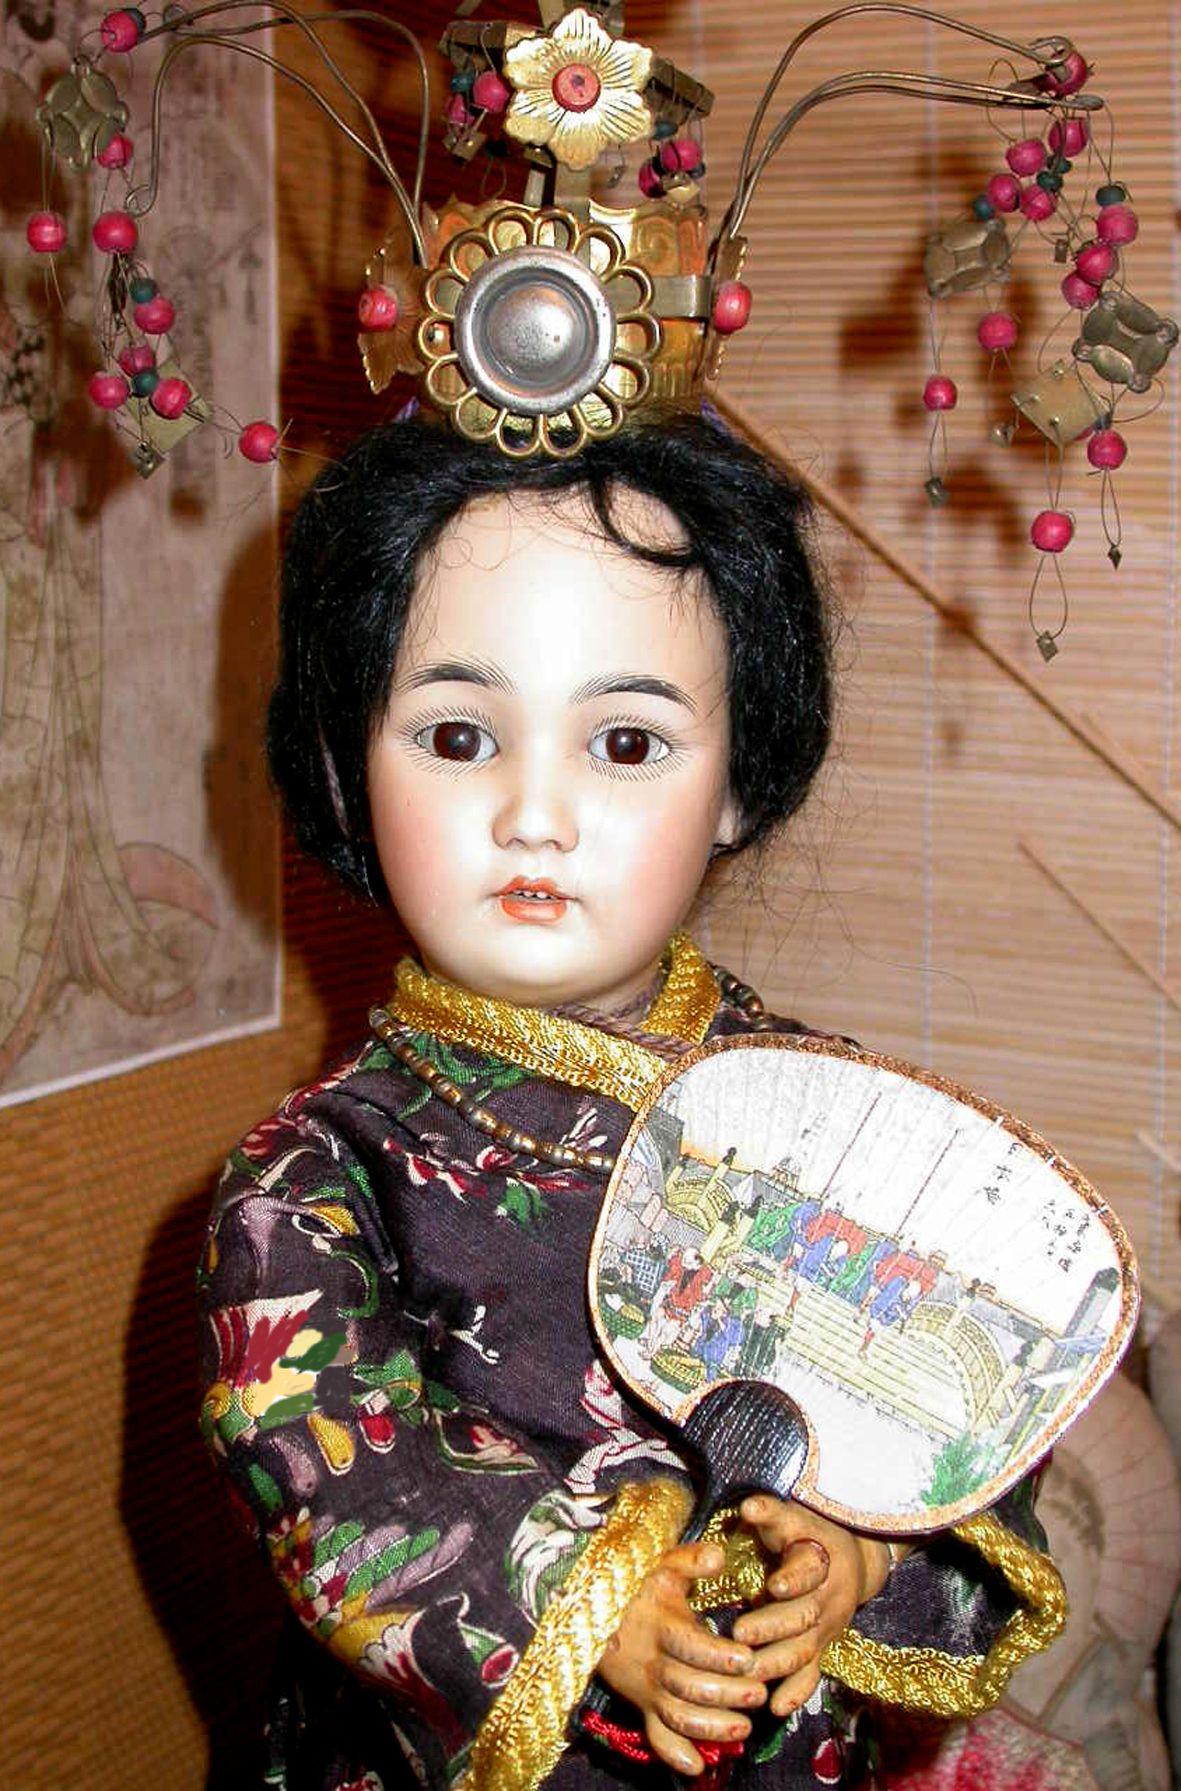 Oriental Simon & Halbig #1329 in fully original condition.